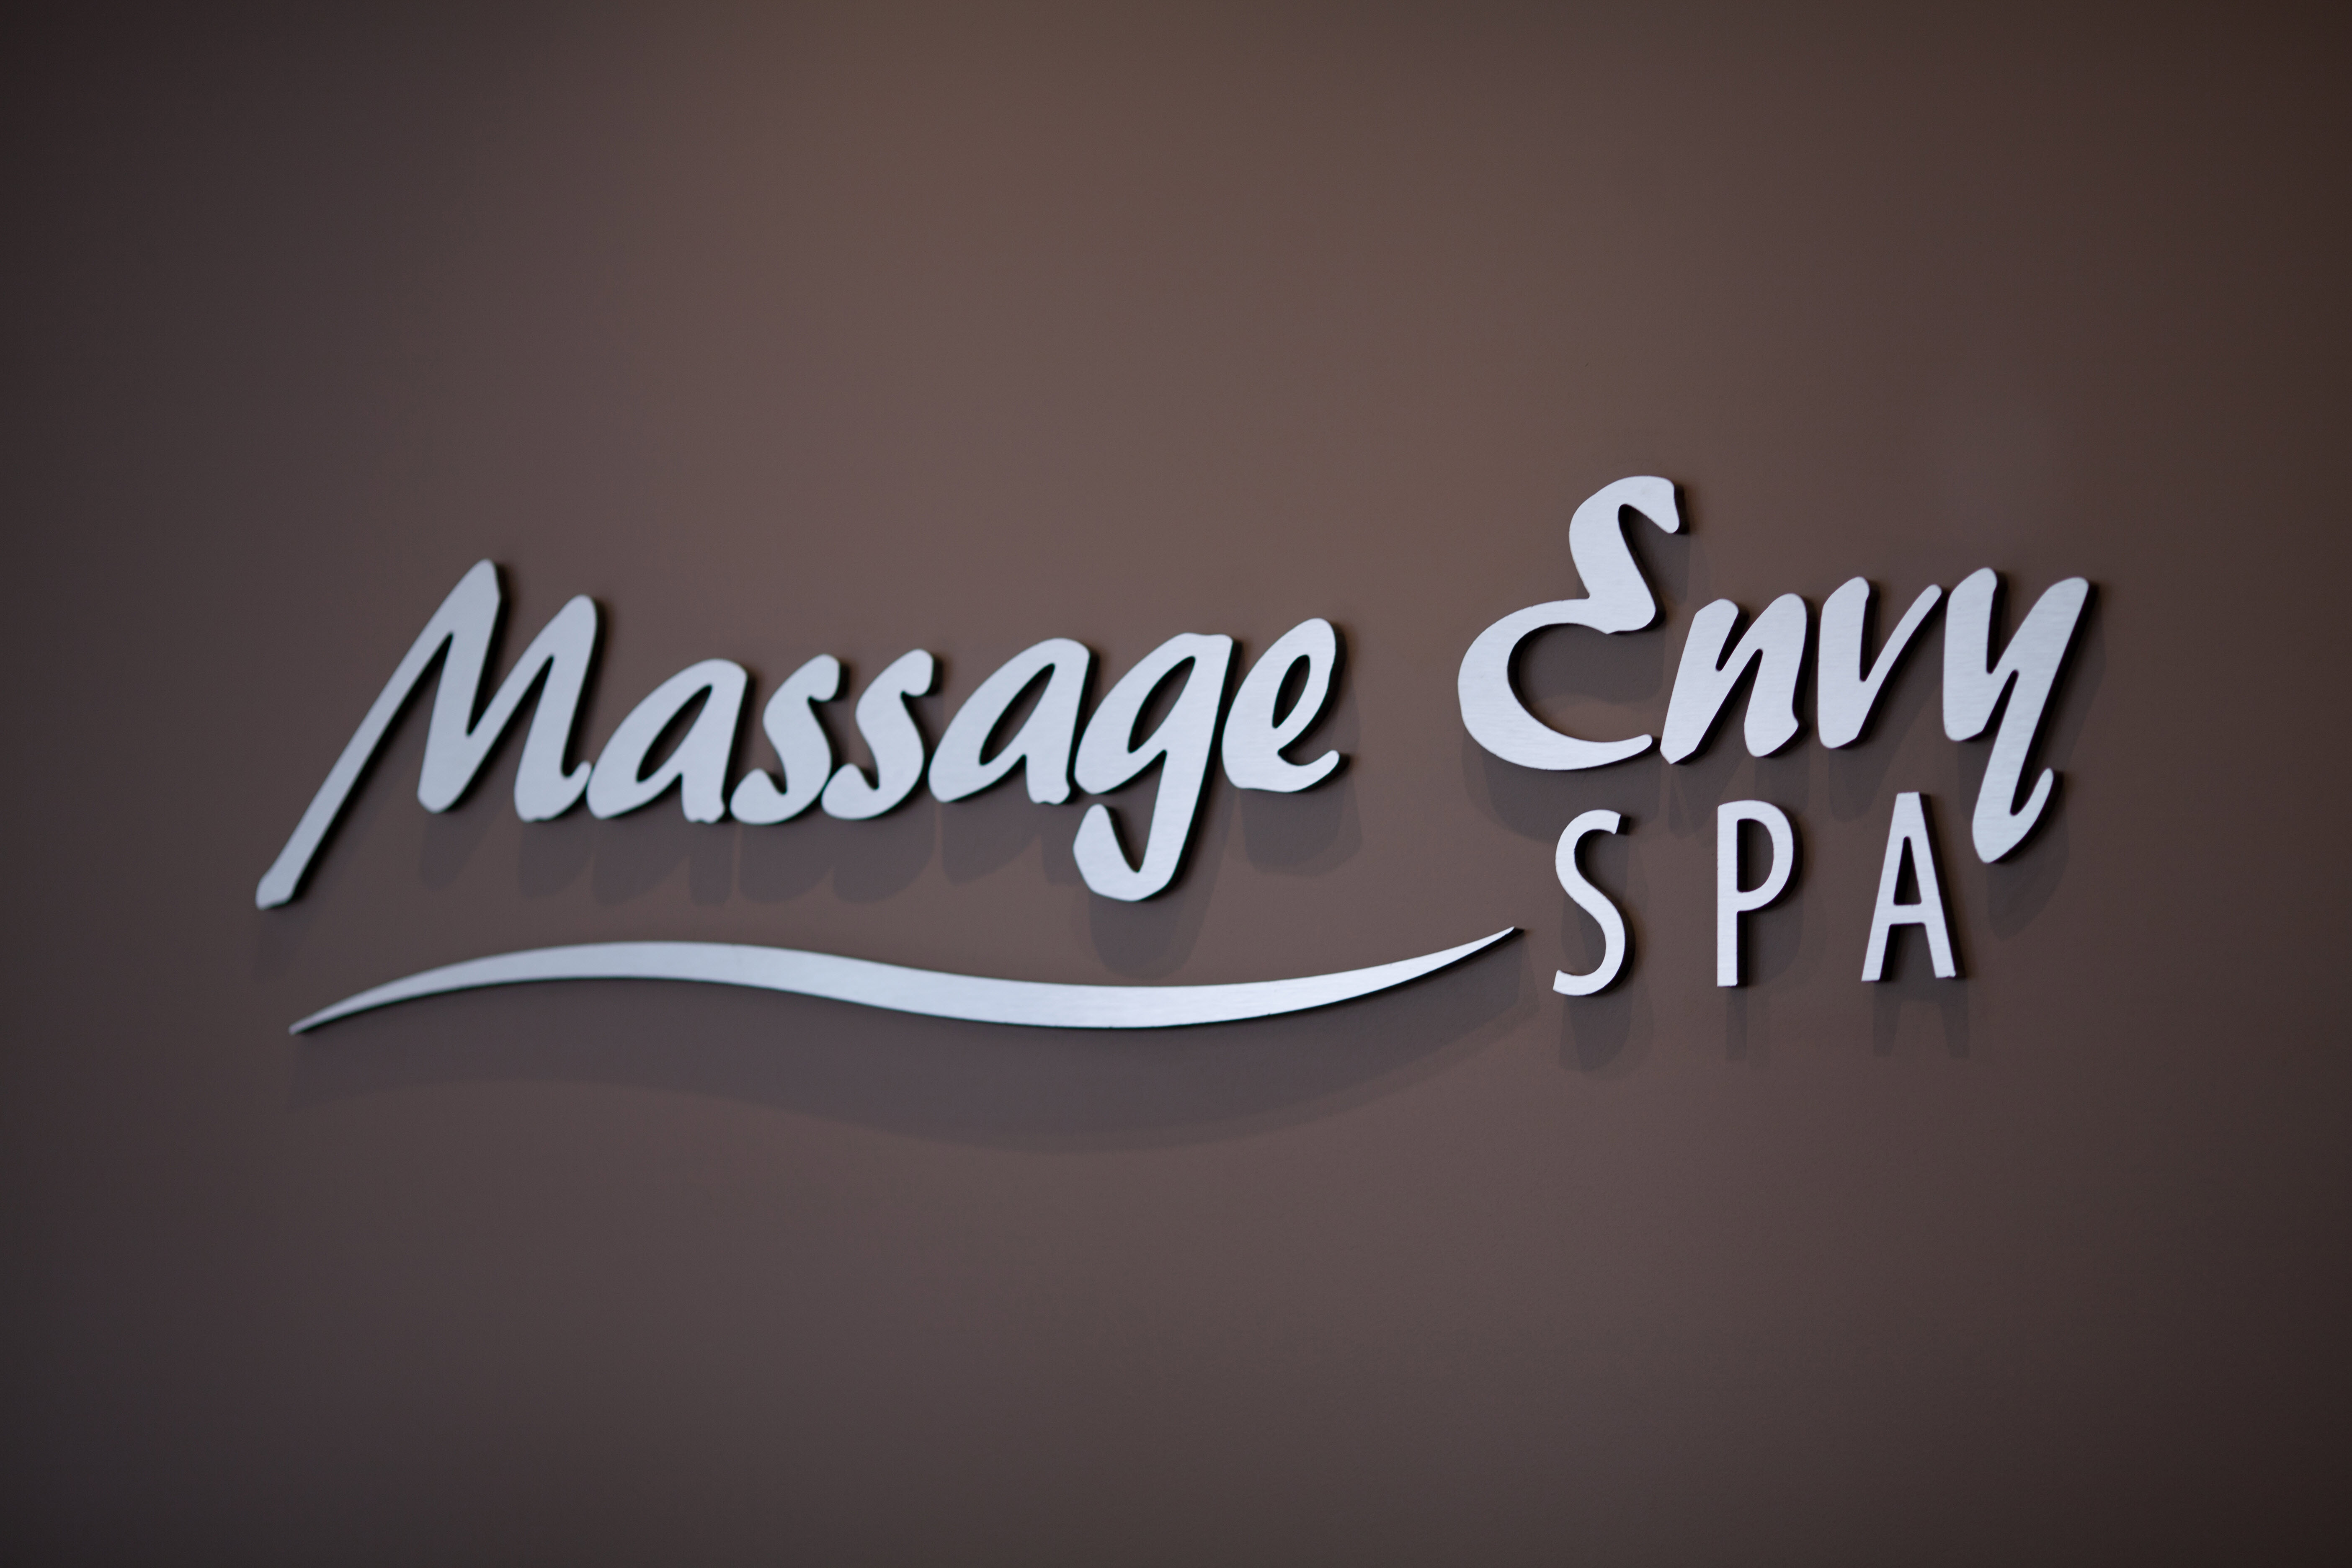 Massage Envy Spa - Bridgewater Falls